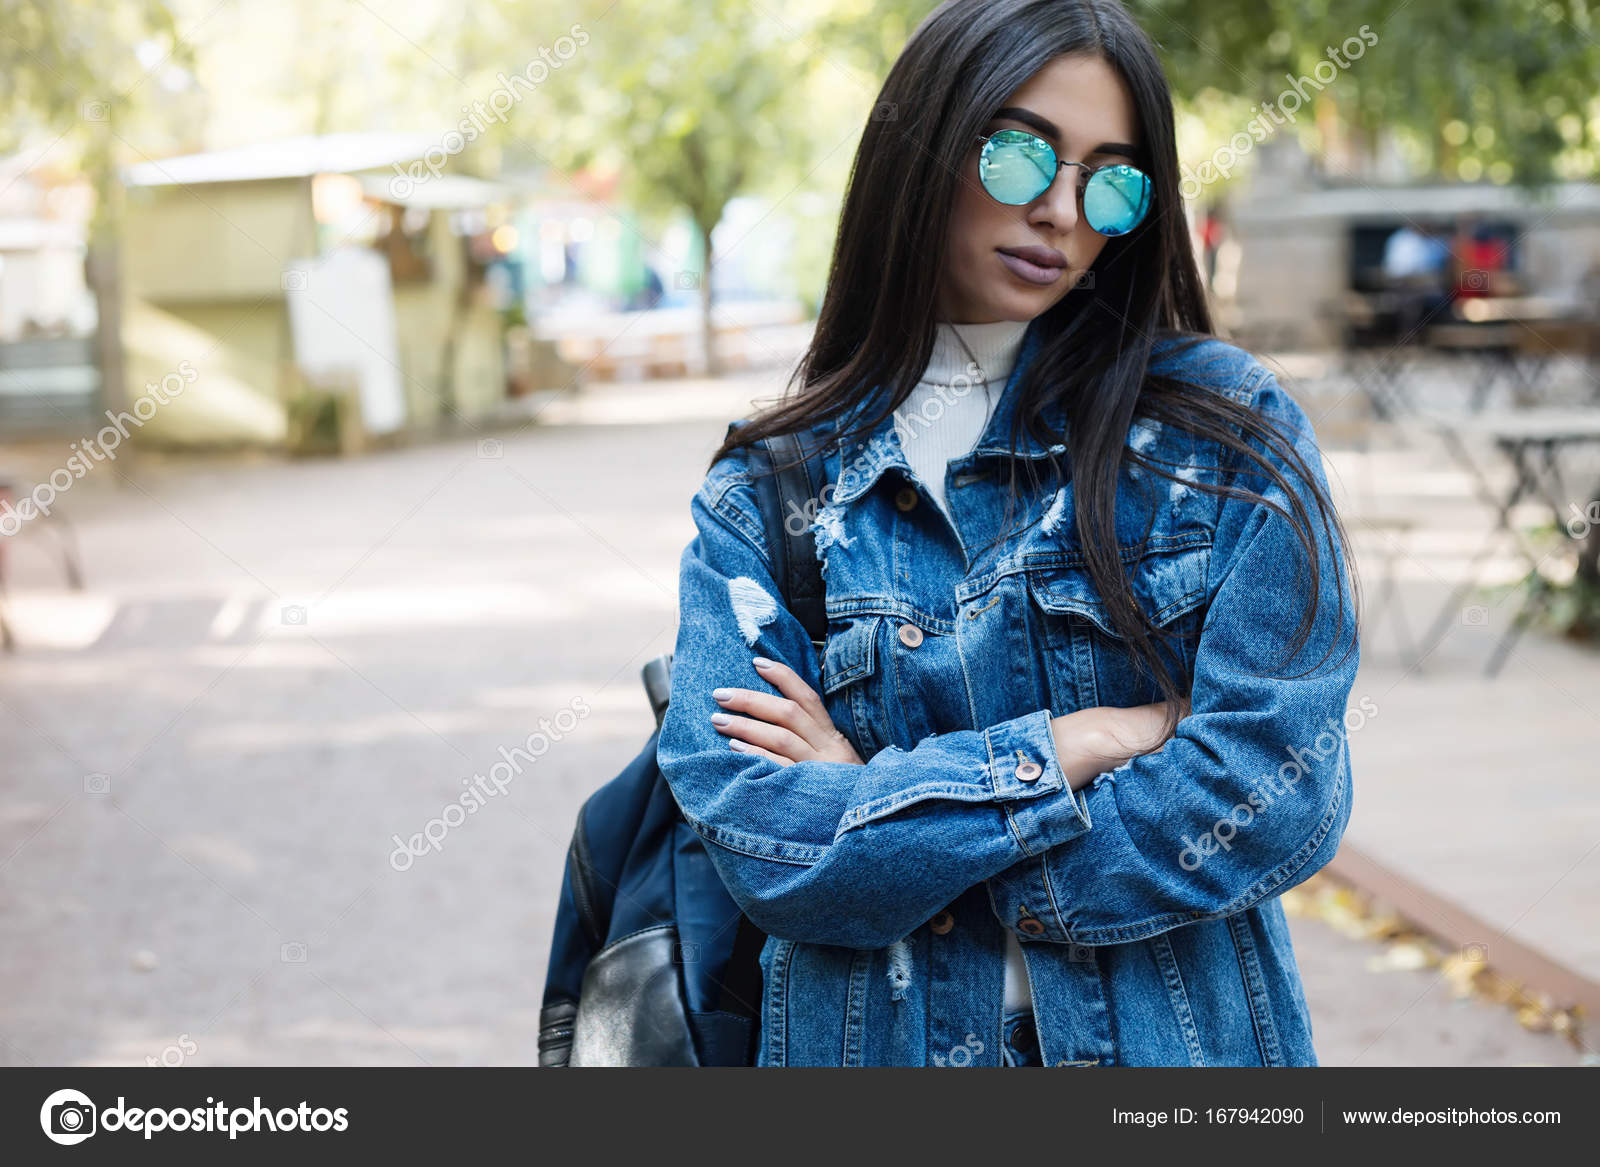 4ec8293b6c Όμορφη κοπέλα με κομψά γυαλιά ηλίου και με ένα μοντέρνο τσάντα στο  ηλιοβασίλεμα. Street Style γυναίκα θέτοντας σε ευρωπαϊκή πόλη — Εικόνα από  ...